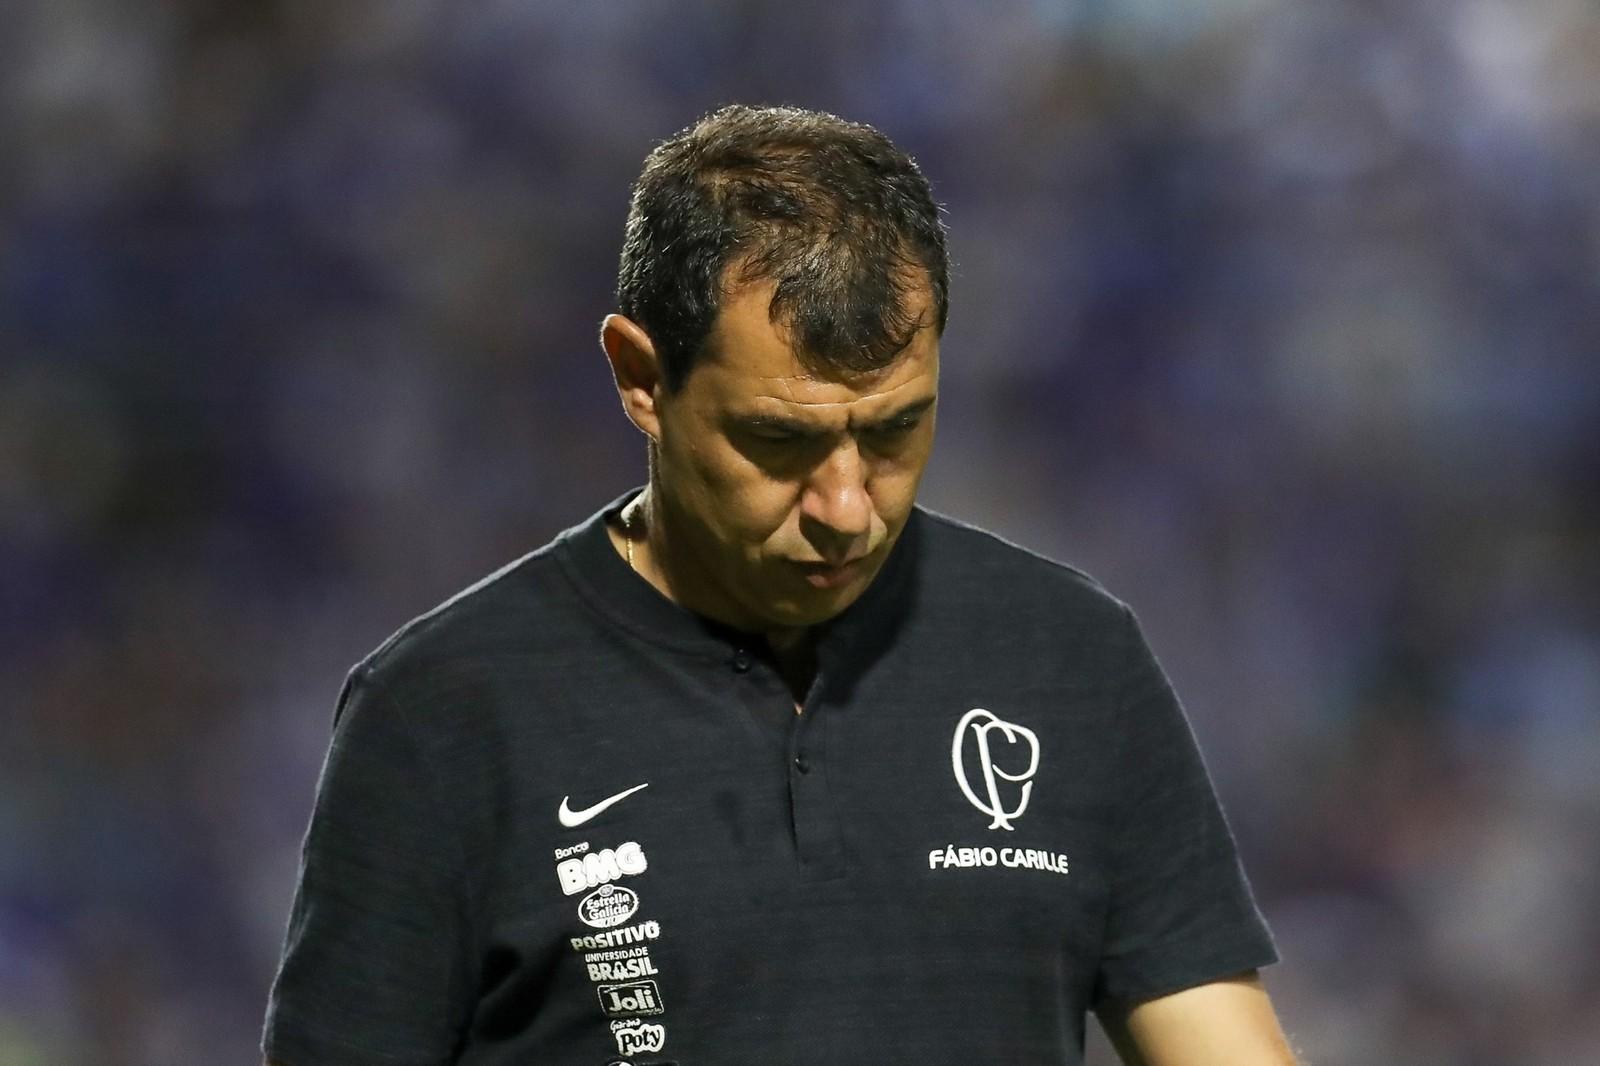 Fábio Carille na partida contra o CSA — Foto: CARLOS EZEQUIEL VANNONI / ESTADÃO CONTEÚDO